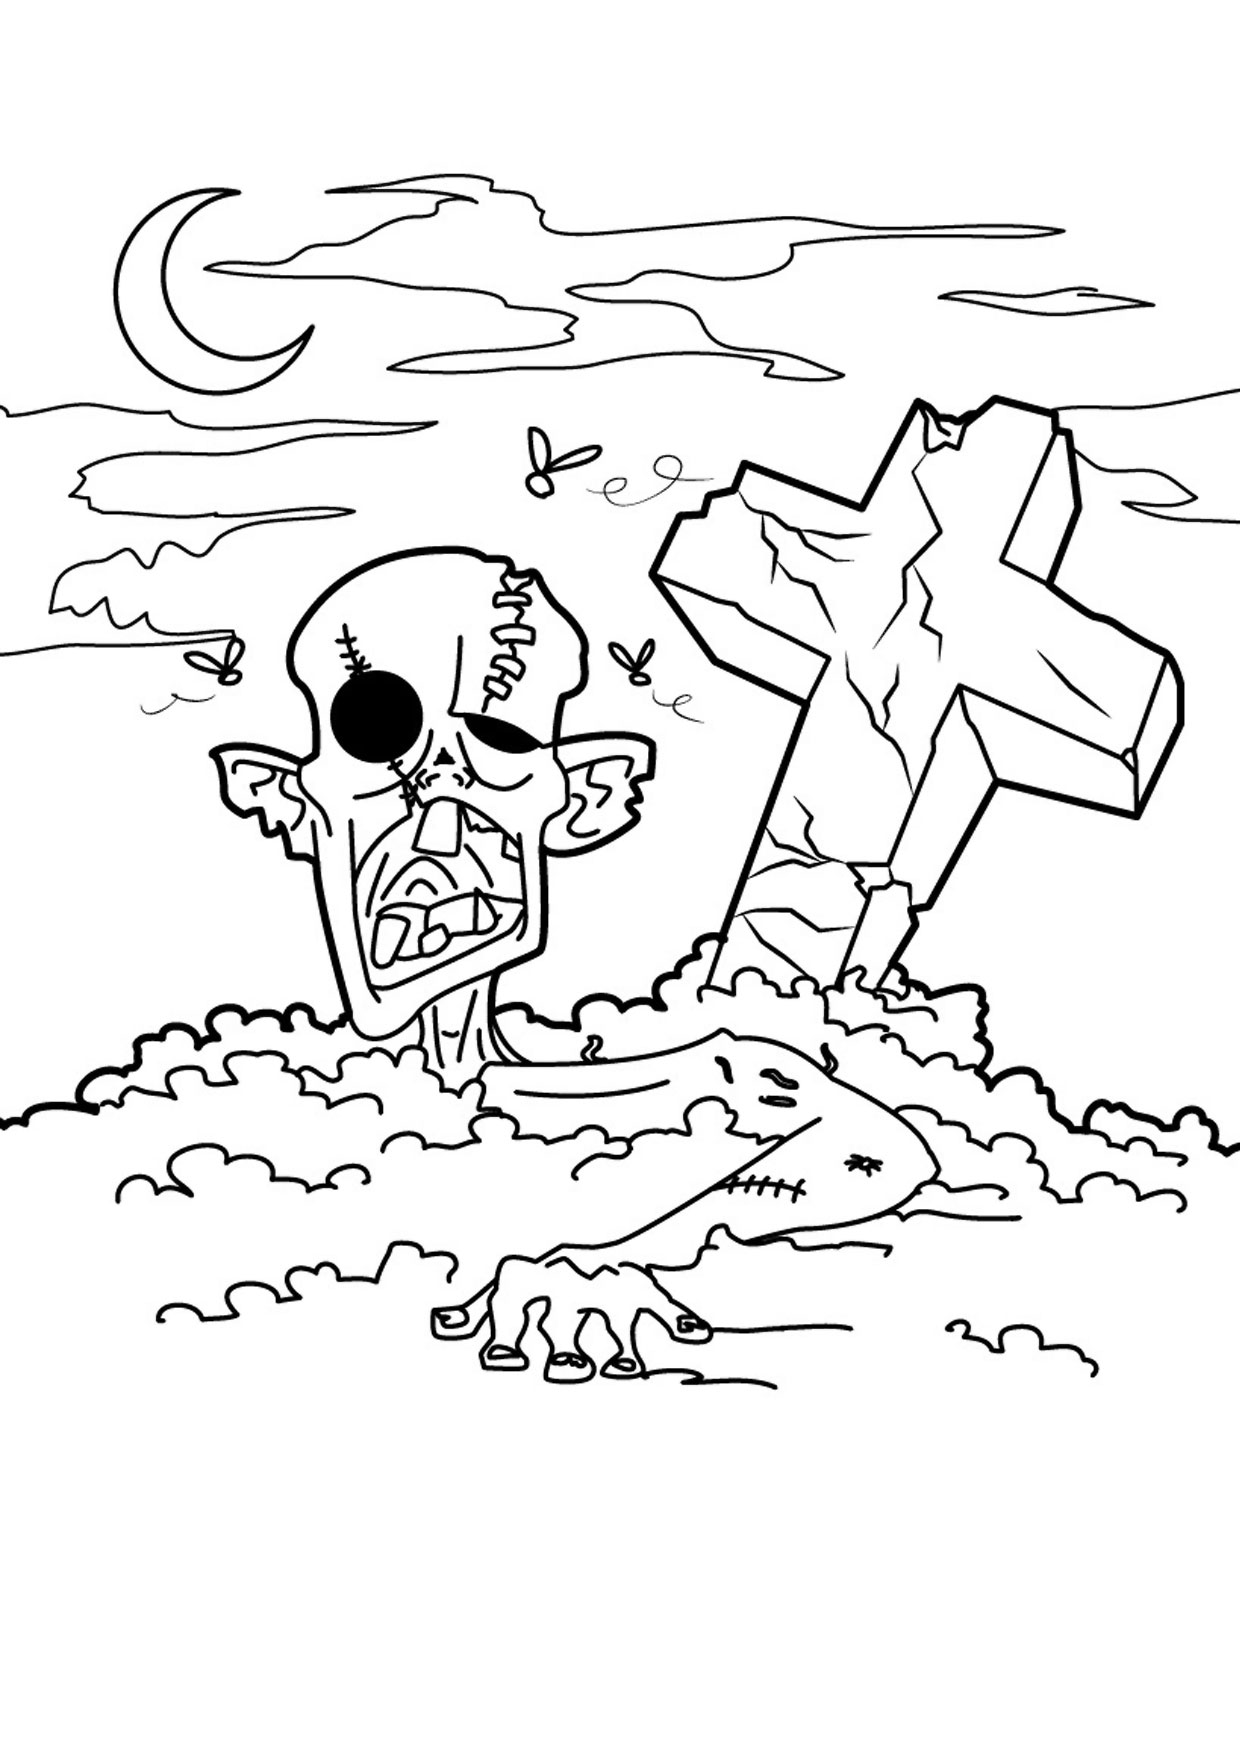 30 Disegni Spaventosi Di Halloween Da Colorare Pianetabambiniit